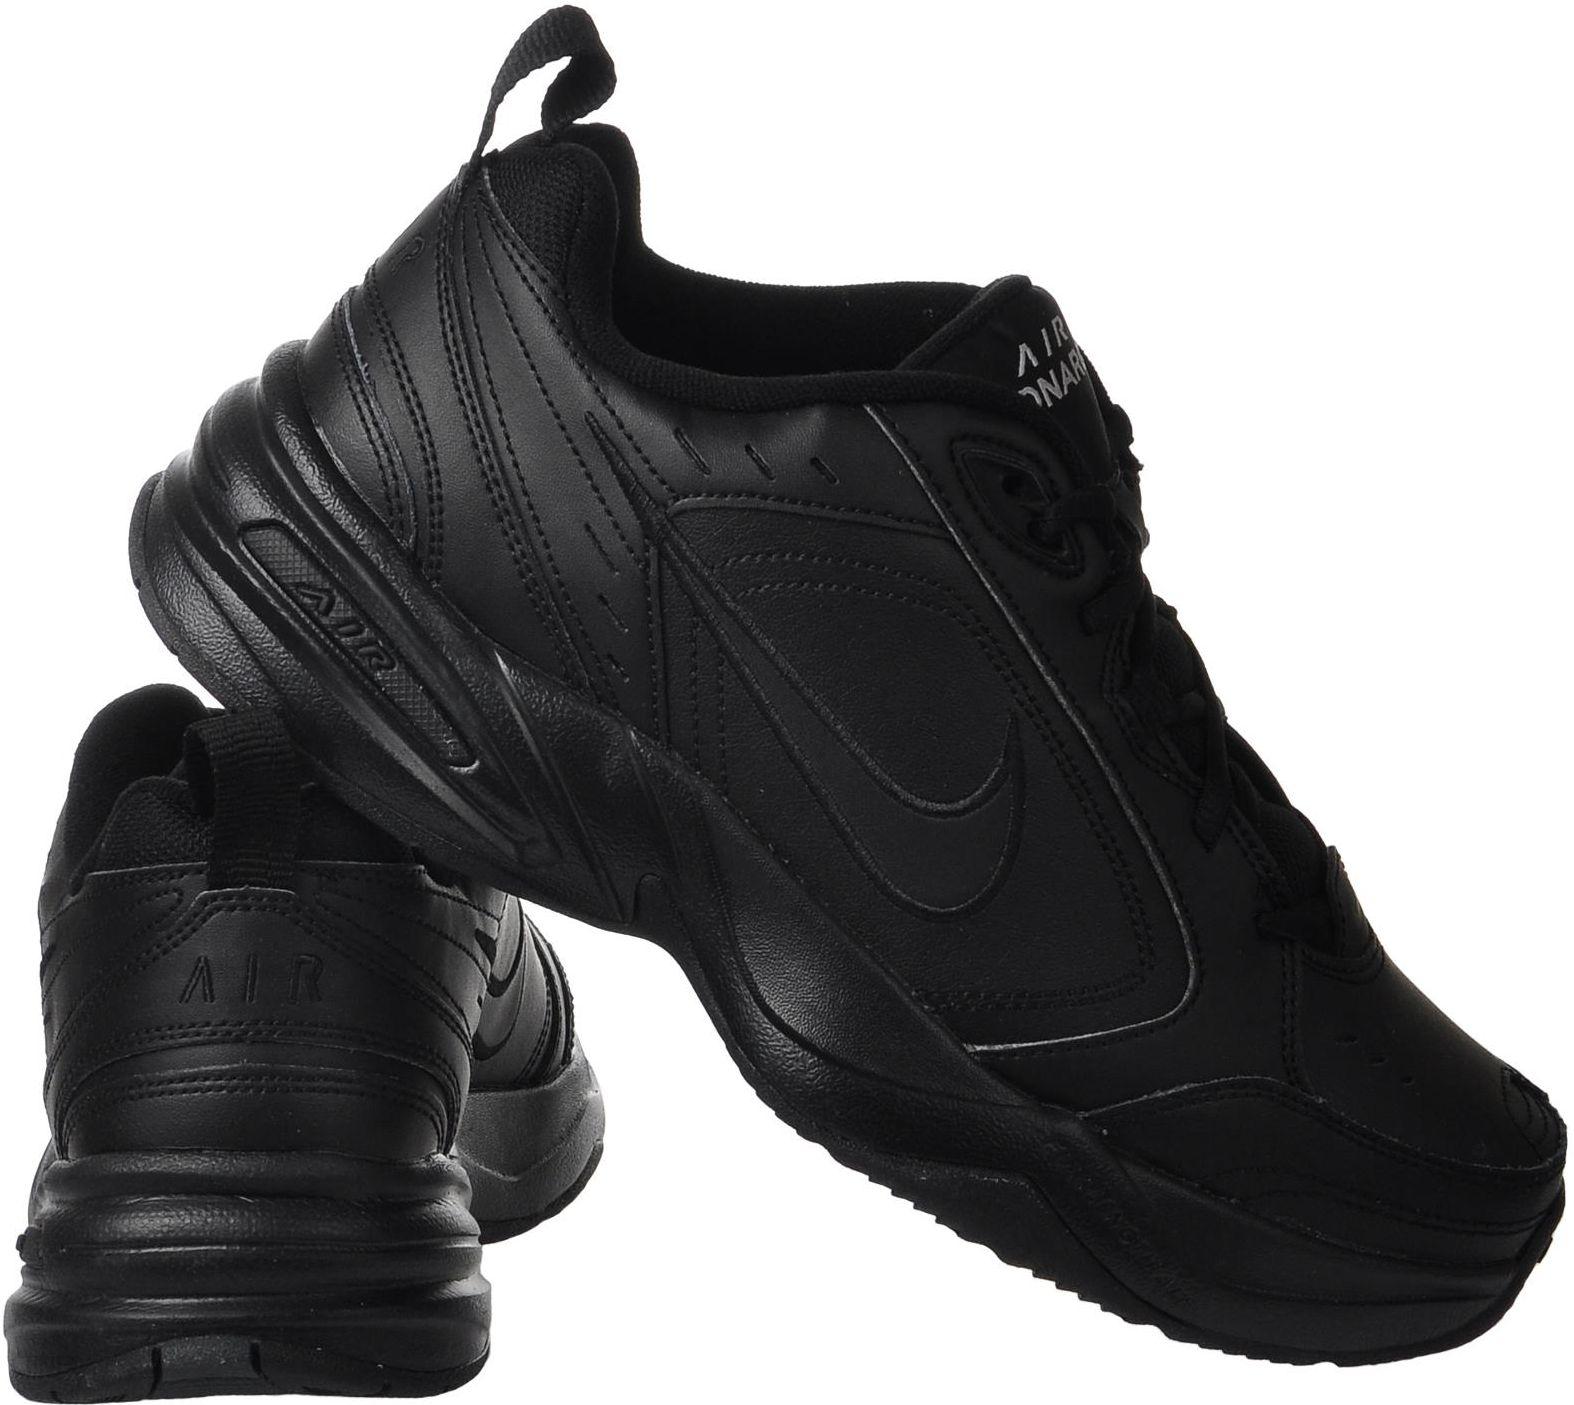 Buty Meskie Nike Air Monarch Czarne Skora R 45 Ceny I Opinie Ceneo Pl